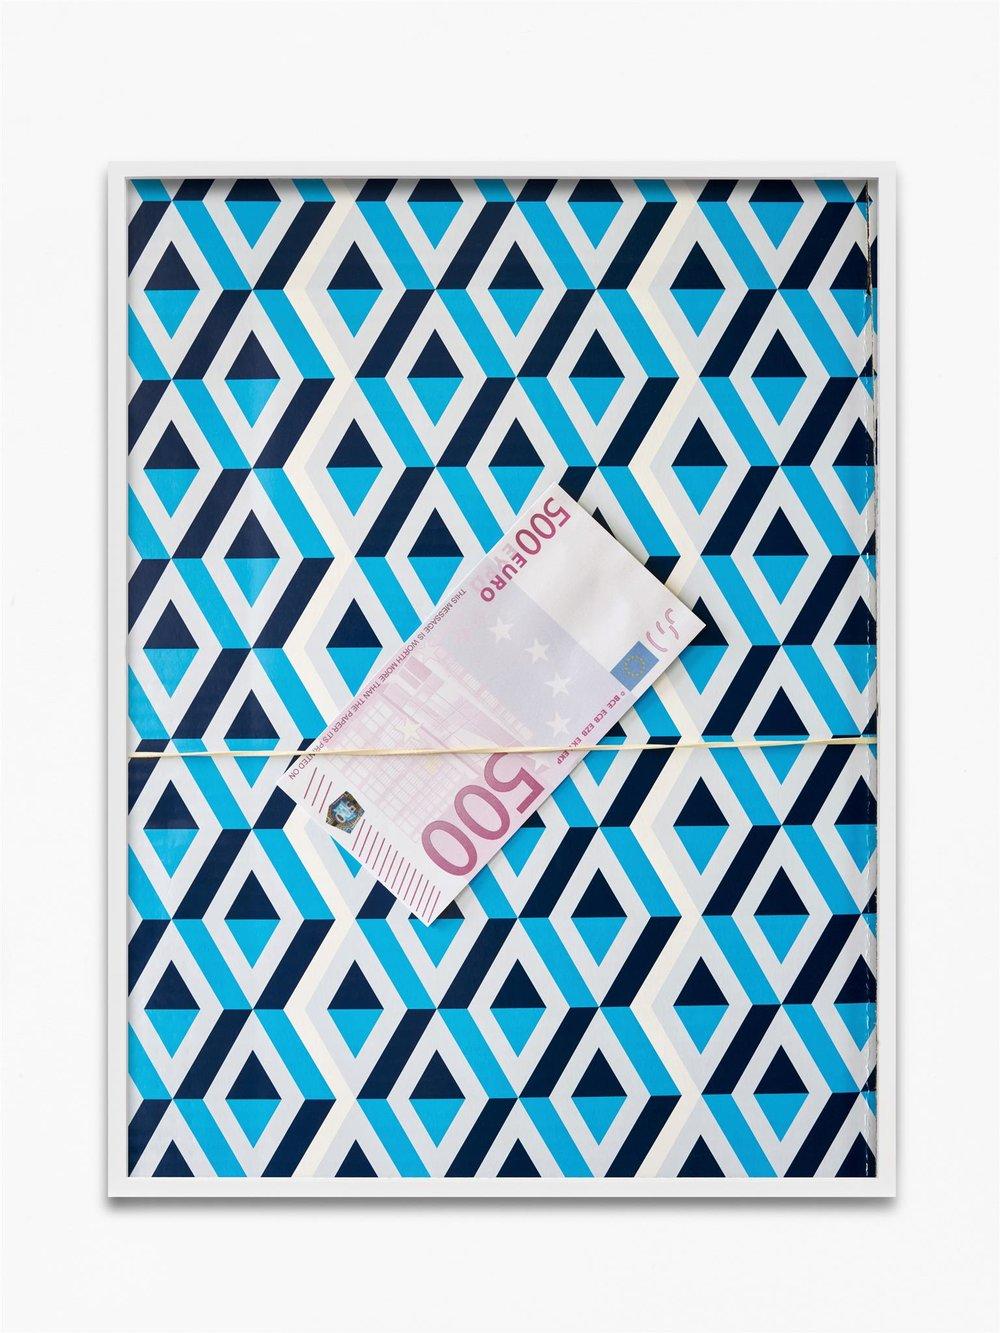 500 Euro  2018  Archival pigment print, framed  75 x 56 cm / 29.5 x 22 in